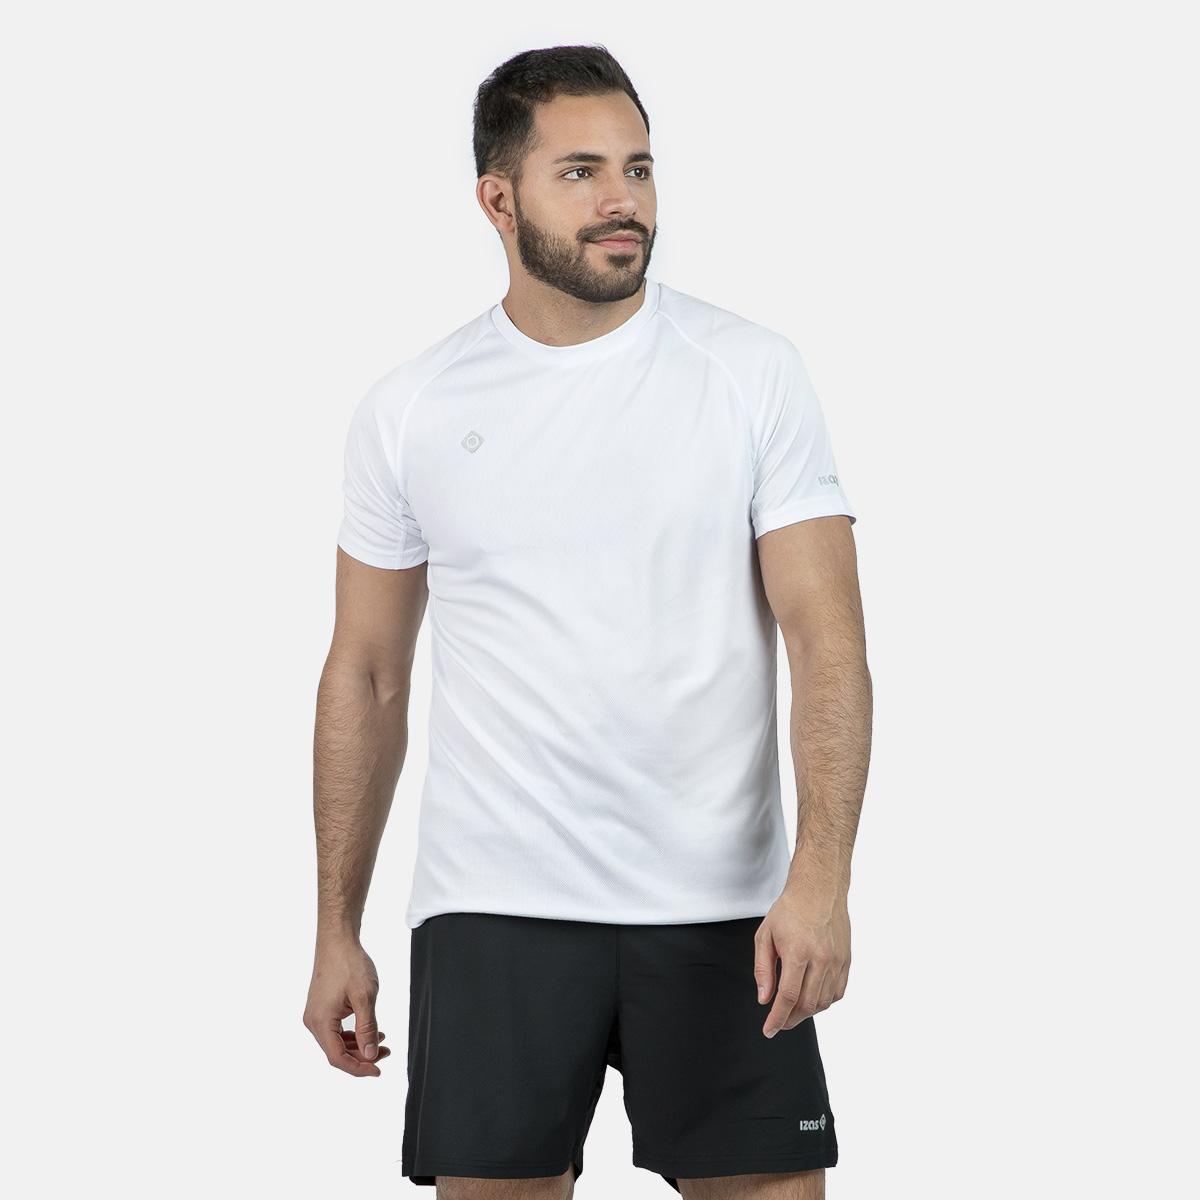 MAN'S CREUS II T-SHIRT WHITE